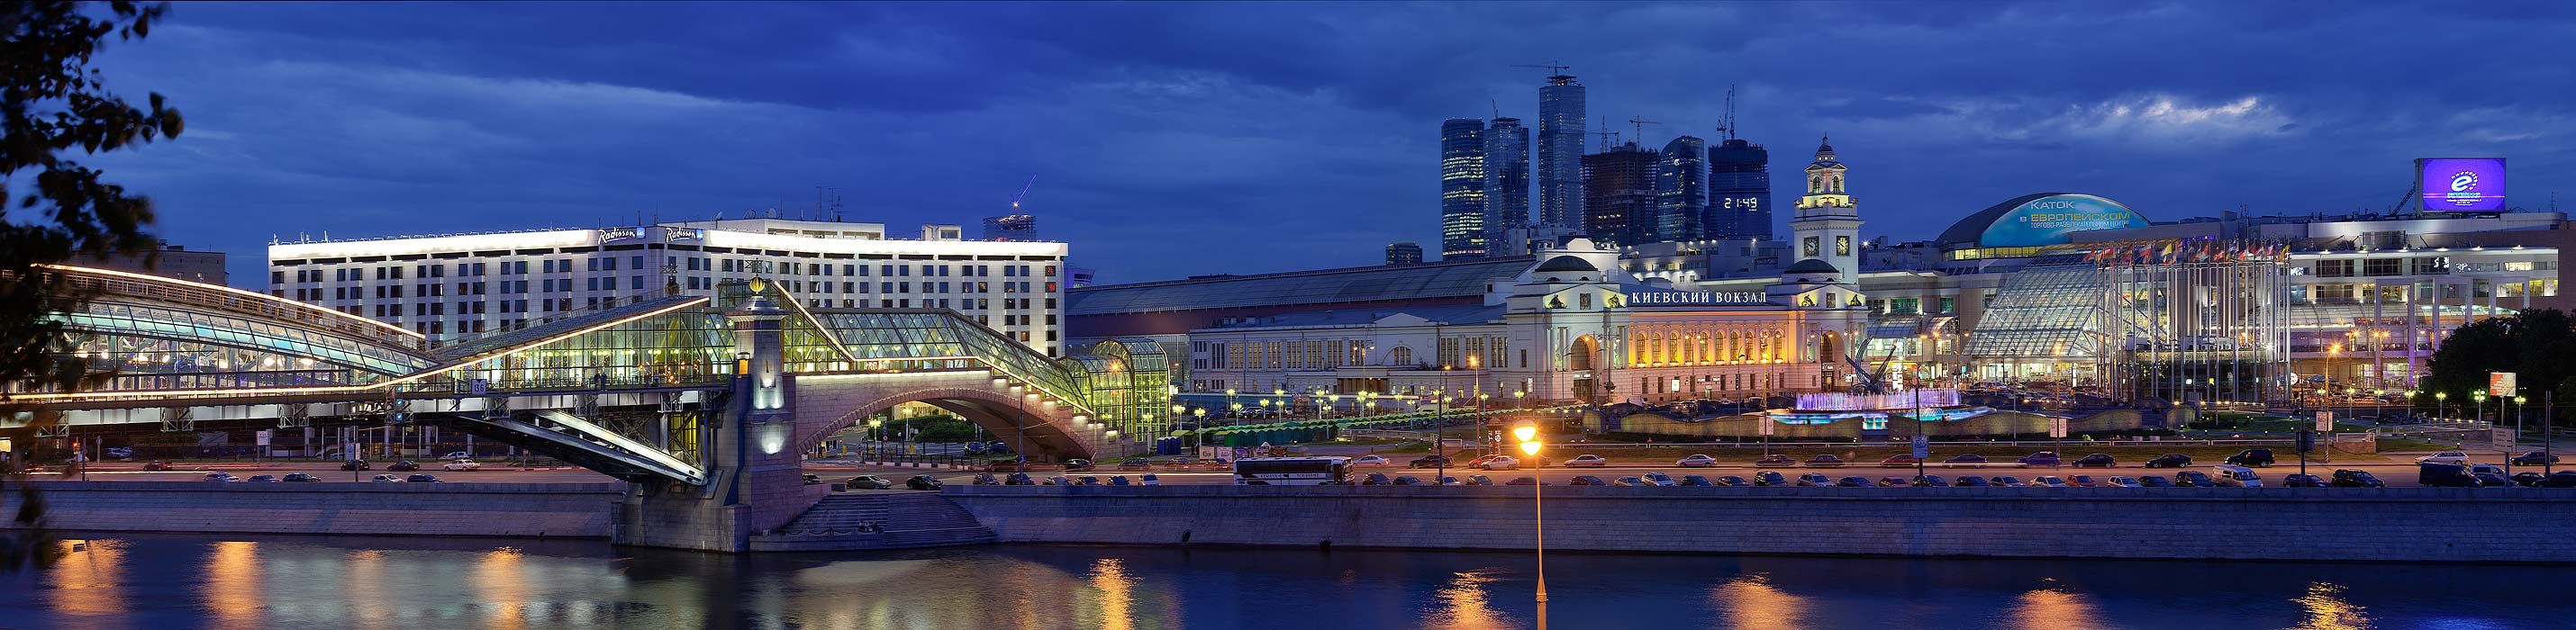 CofranceSARL: Павелецкий вокзал Москвы